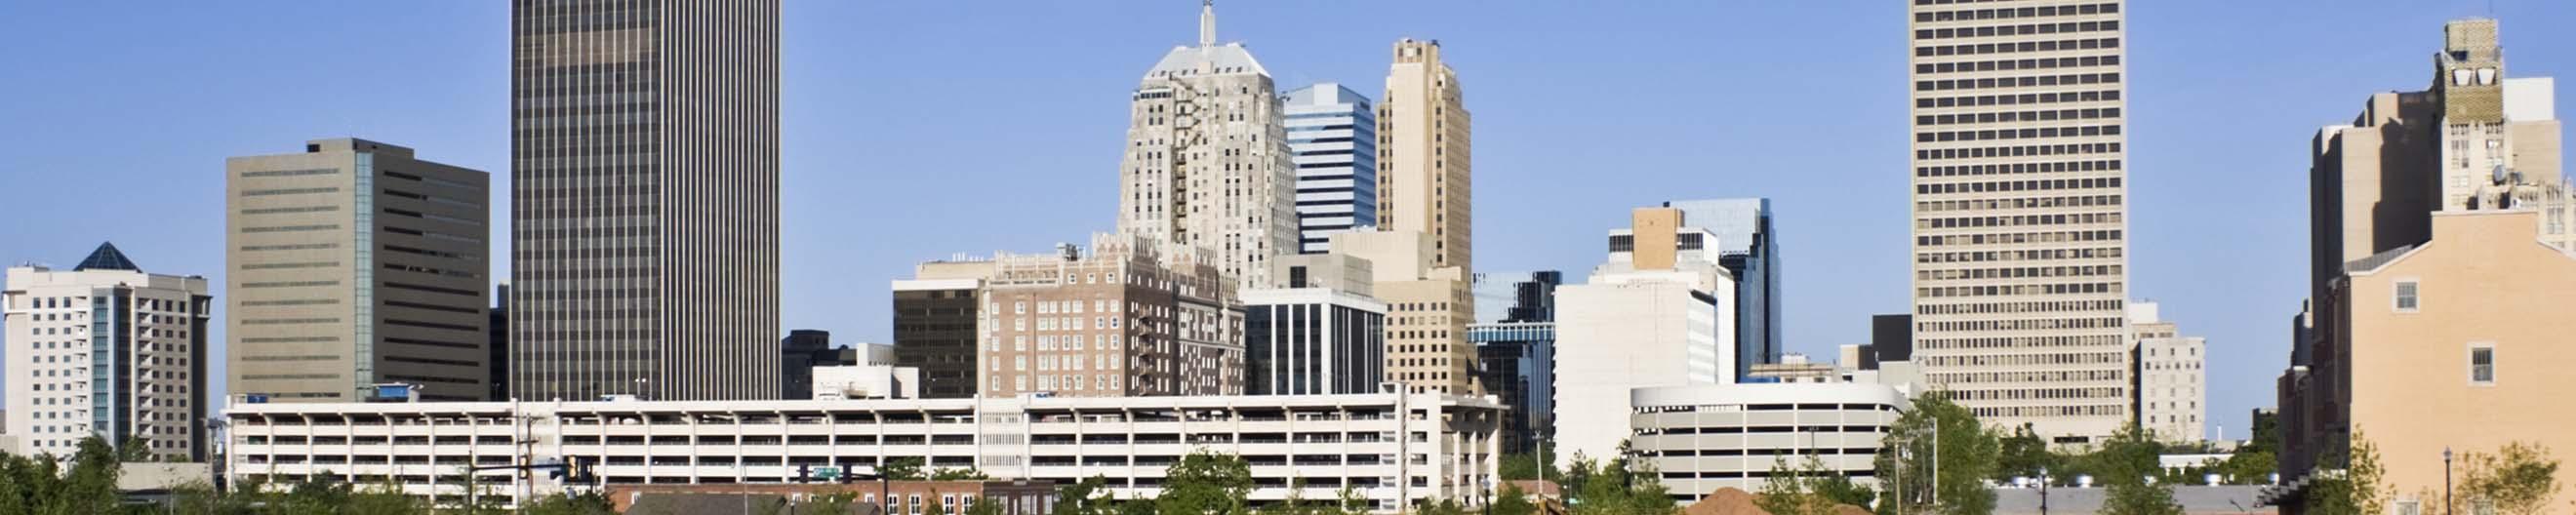 casinos in oklahoma city area